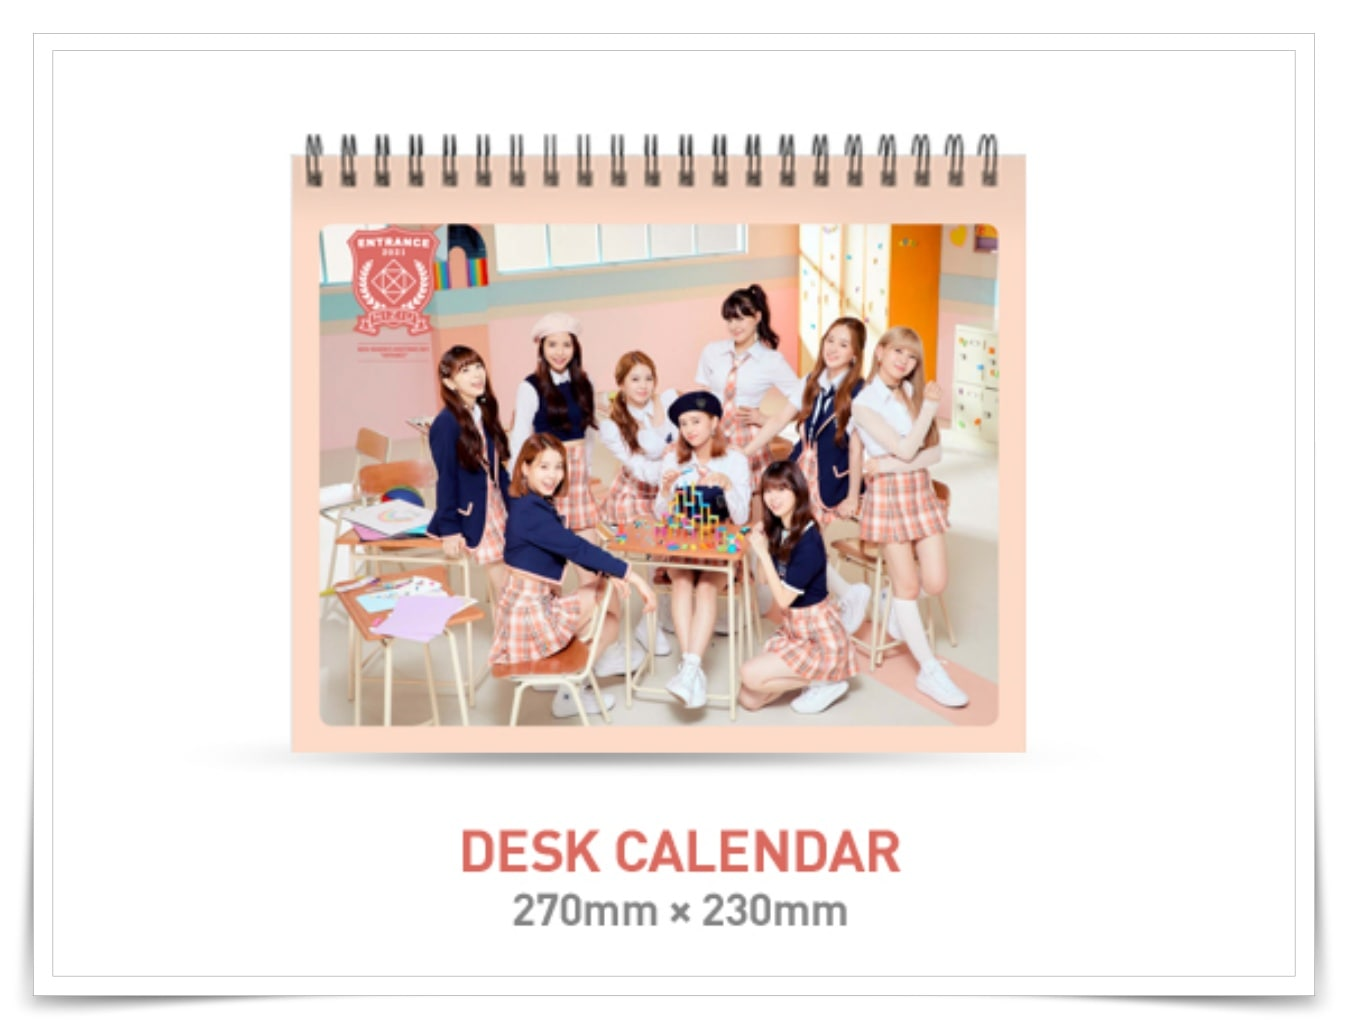 NiziU二ジュー2021カレンダーの画像